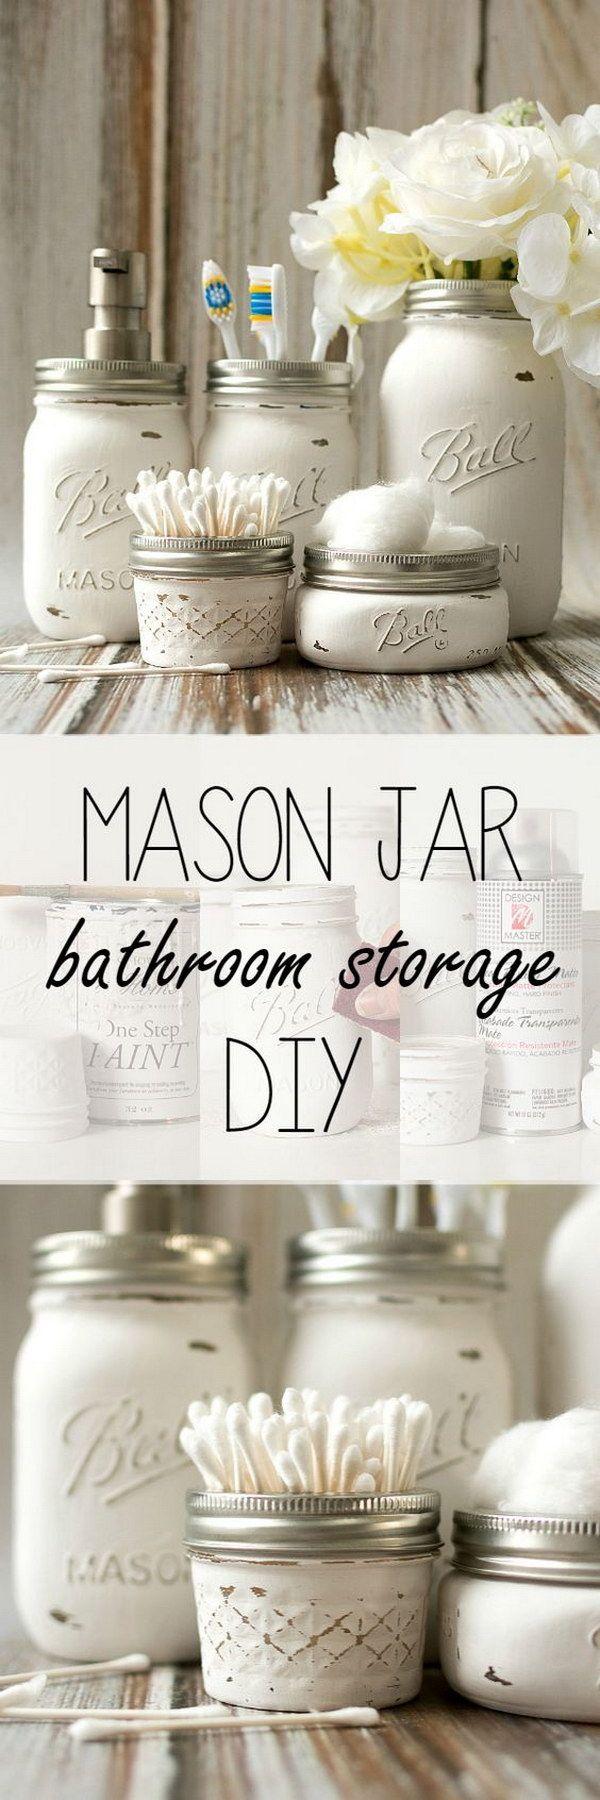 Shabby chic bathroom storage - Best 20 Shabby Chic Storage Ideas On Pinterest Shabby Chic Style Shabby Chic Decor And Shabby Chic Bathrooms